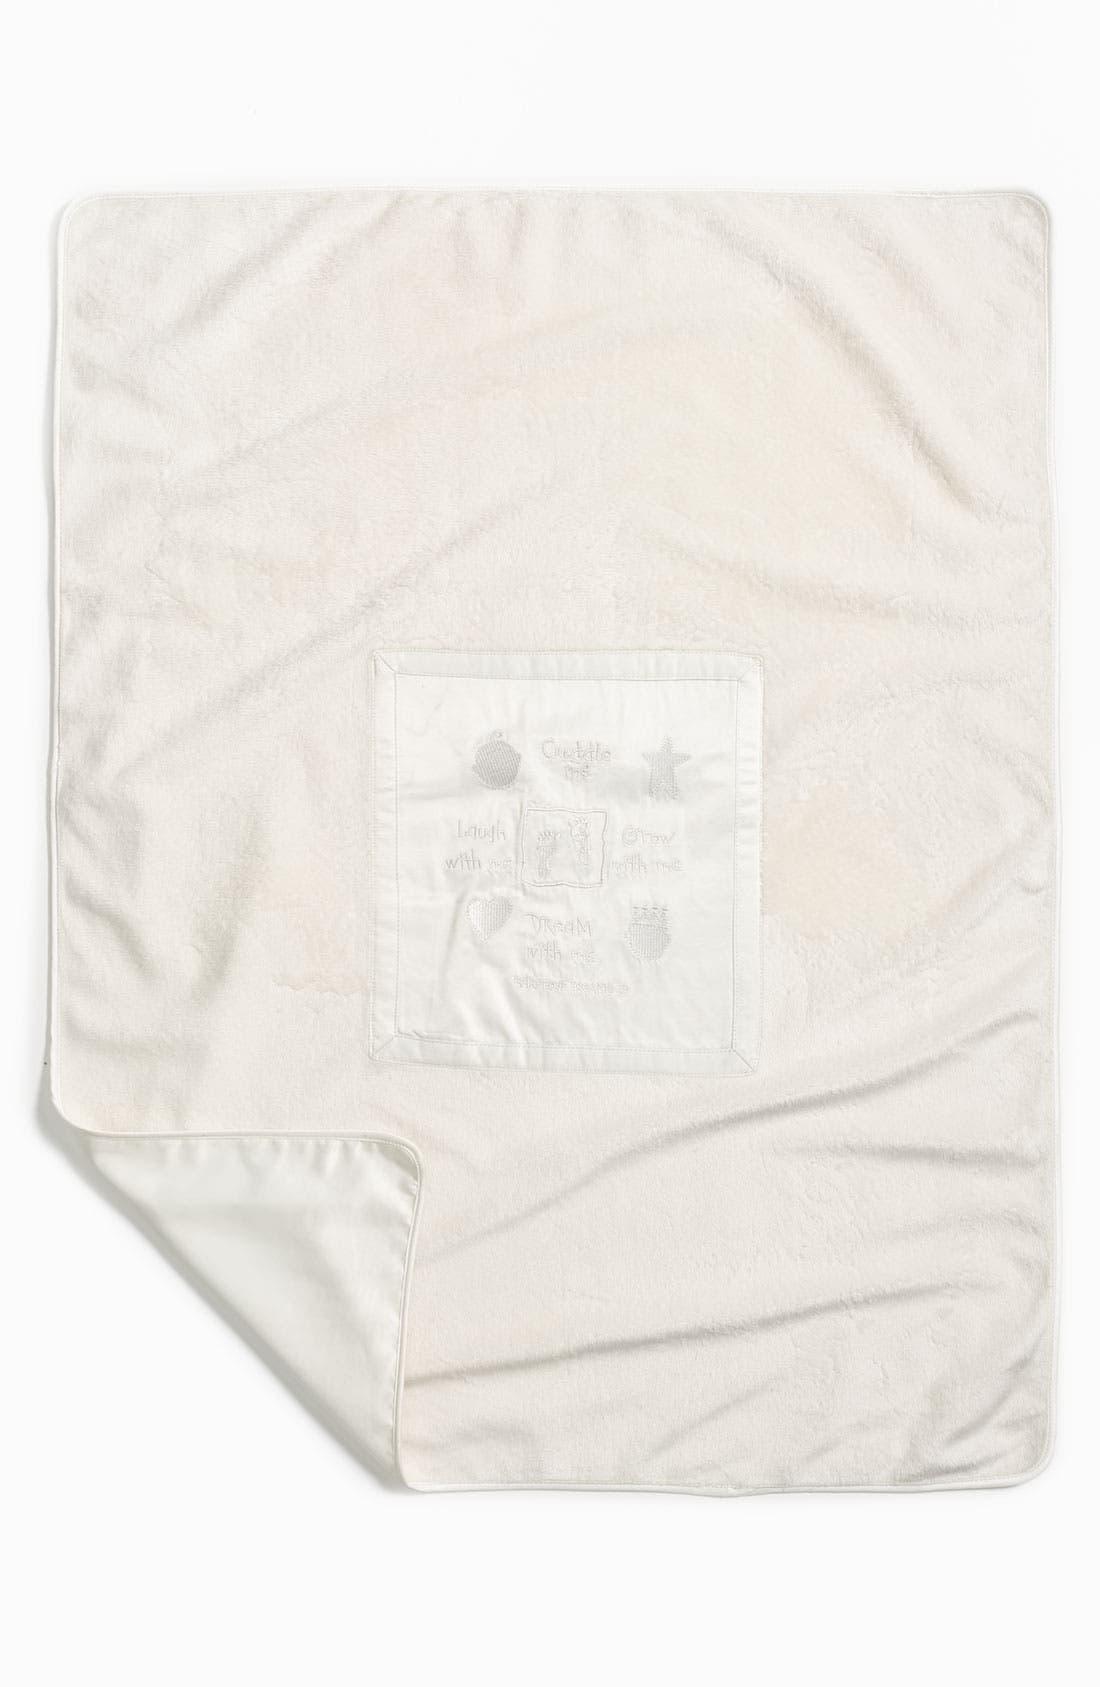 Alternate Image 1 Selected - Barefoot Dreams® Signature Plush Blanket